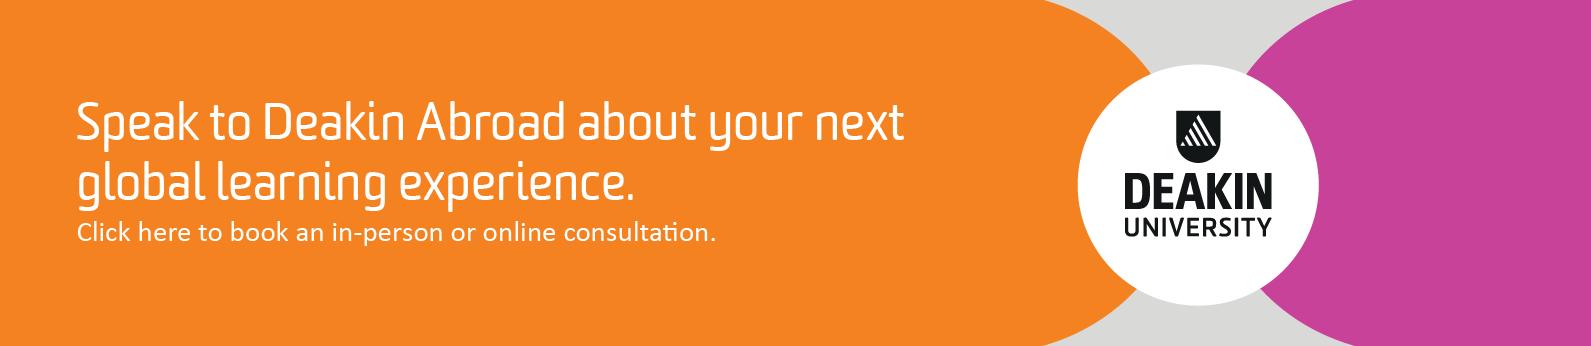 Book a consultation banner